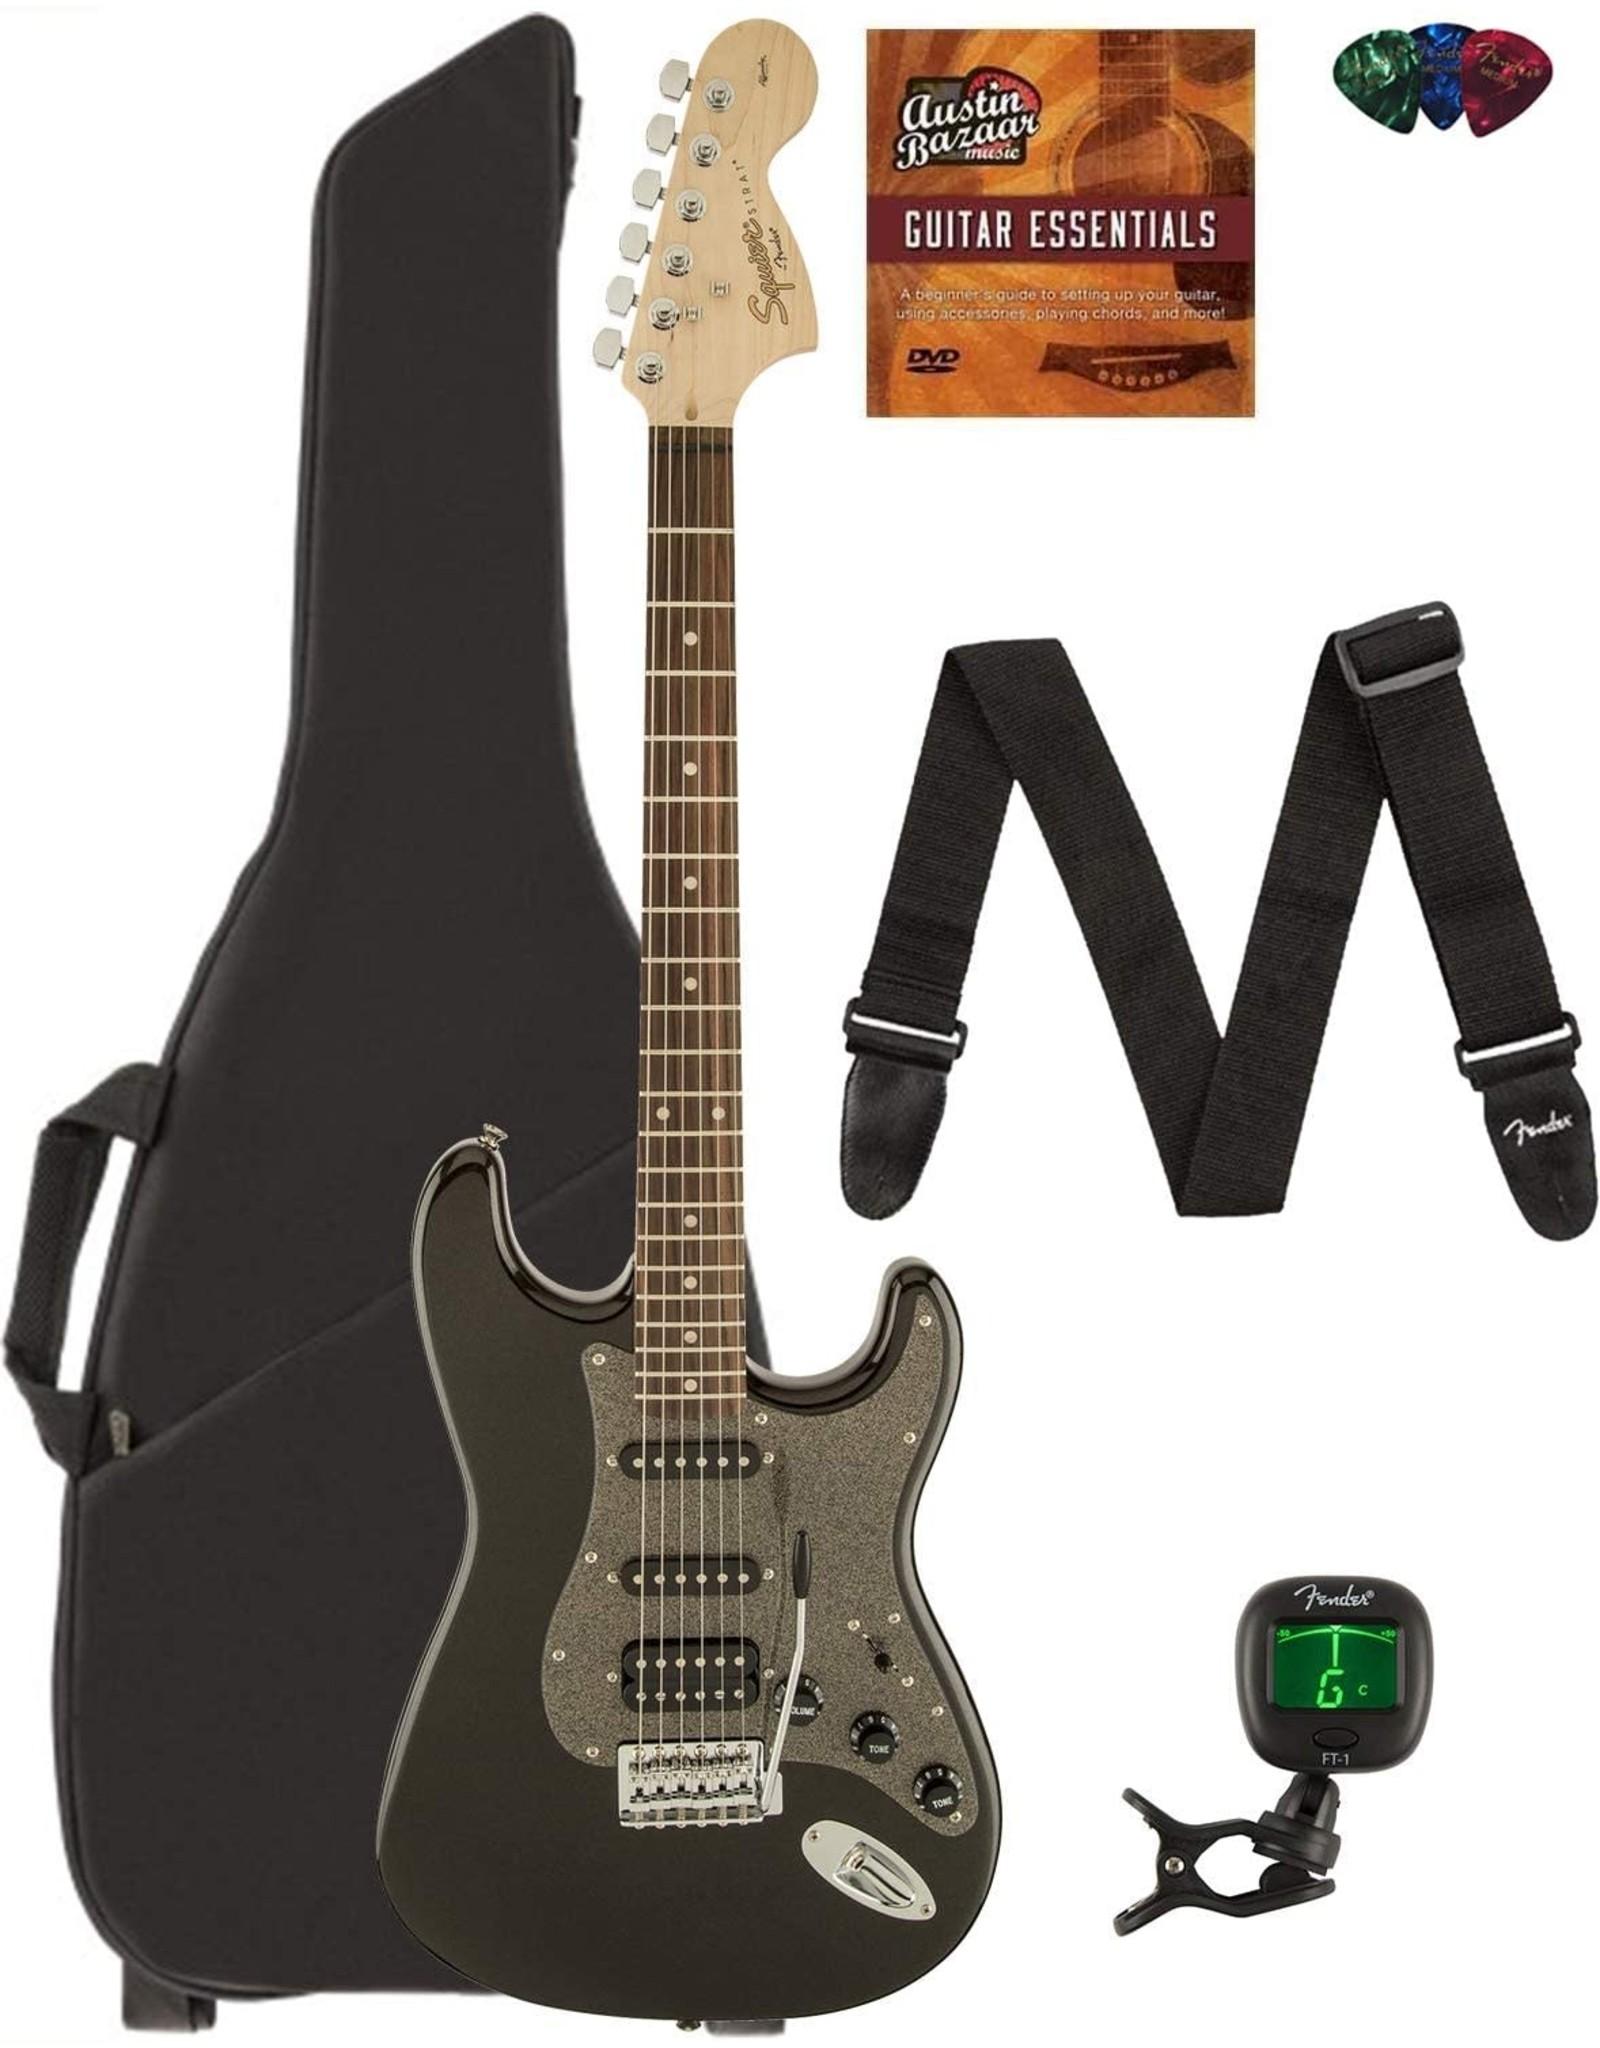 Fender Fender Squier Affinity Stratocaster HSS - Montego Black Metallic Bundle with Gig Bag, Tuner, Strap, Picks, and Austin Bazaar Instructional DVD